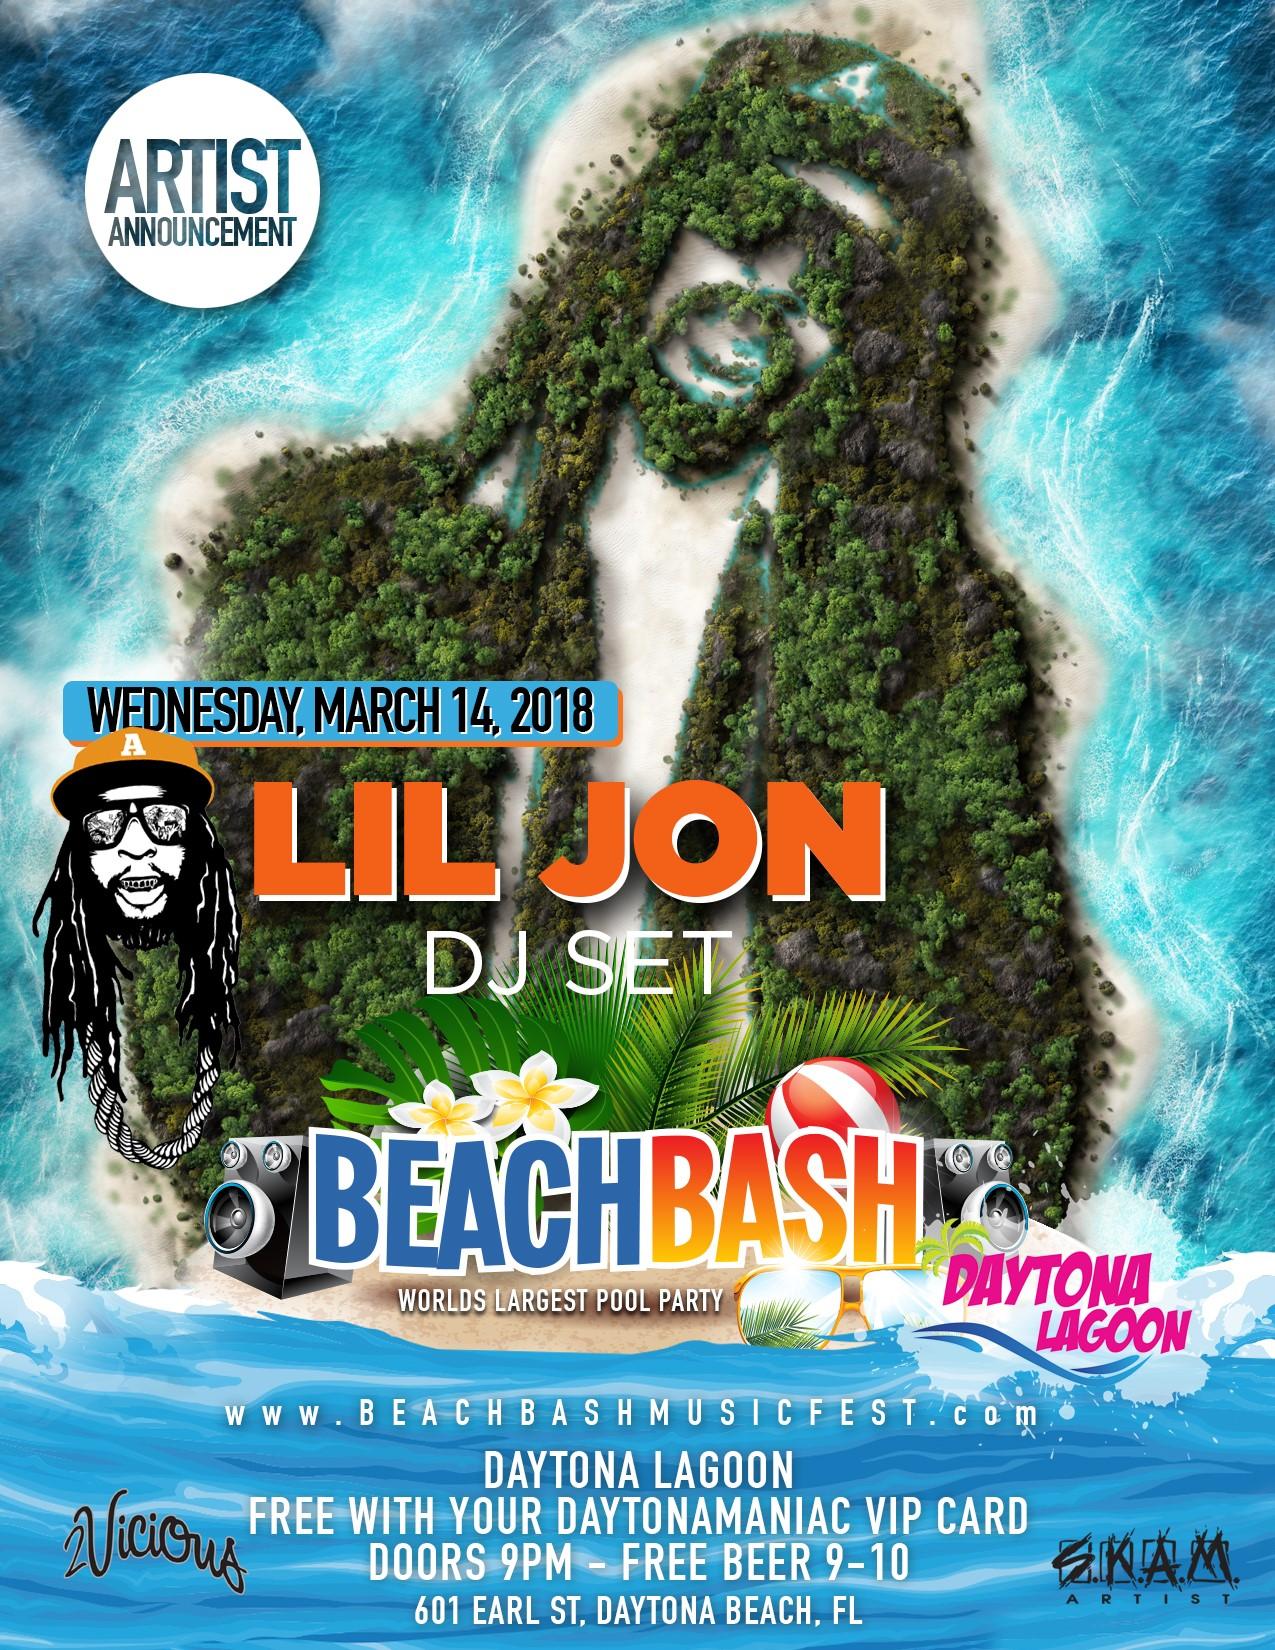 2018 Daytona Charger: Beach Bash Music Fest: Spring Break 2018 Daytona Beach